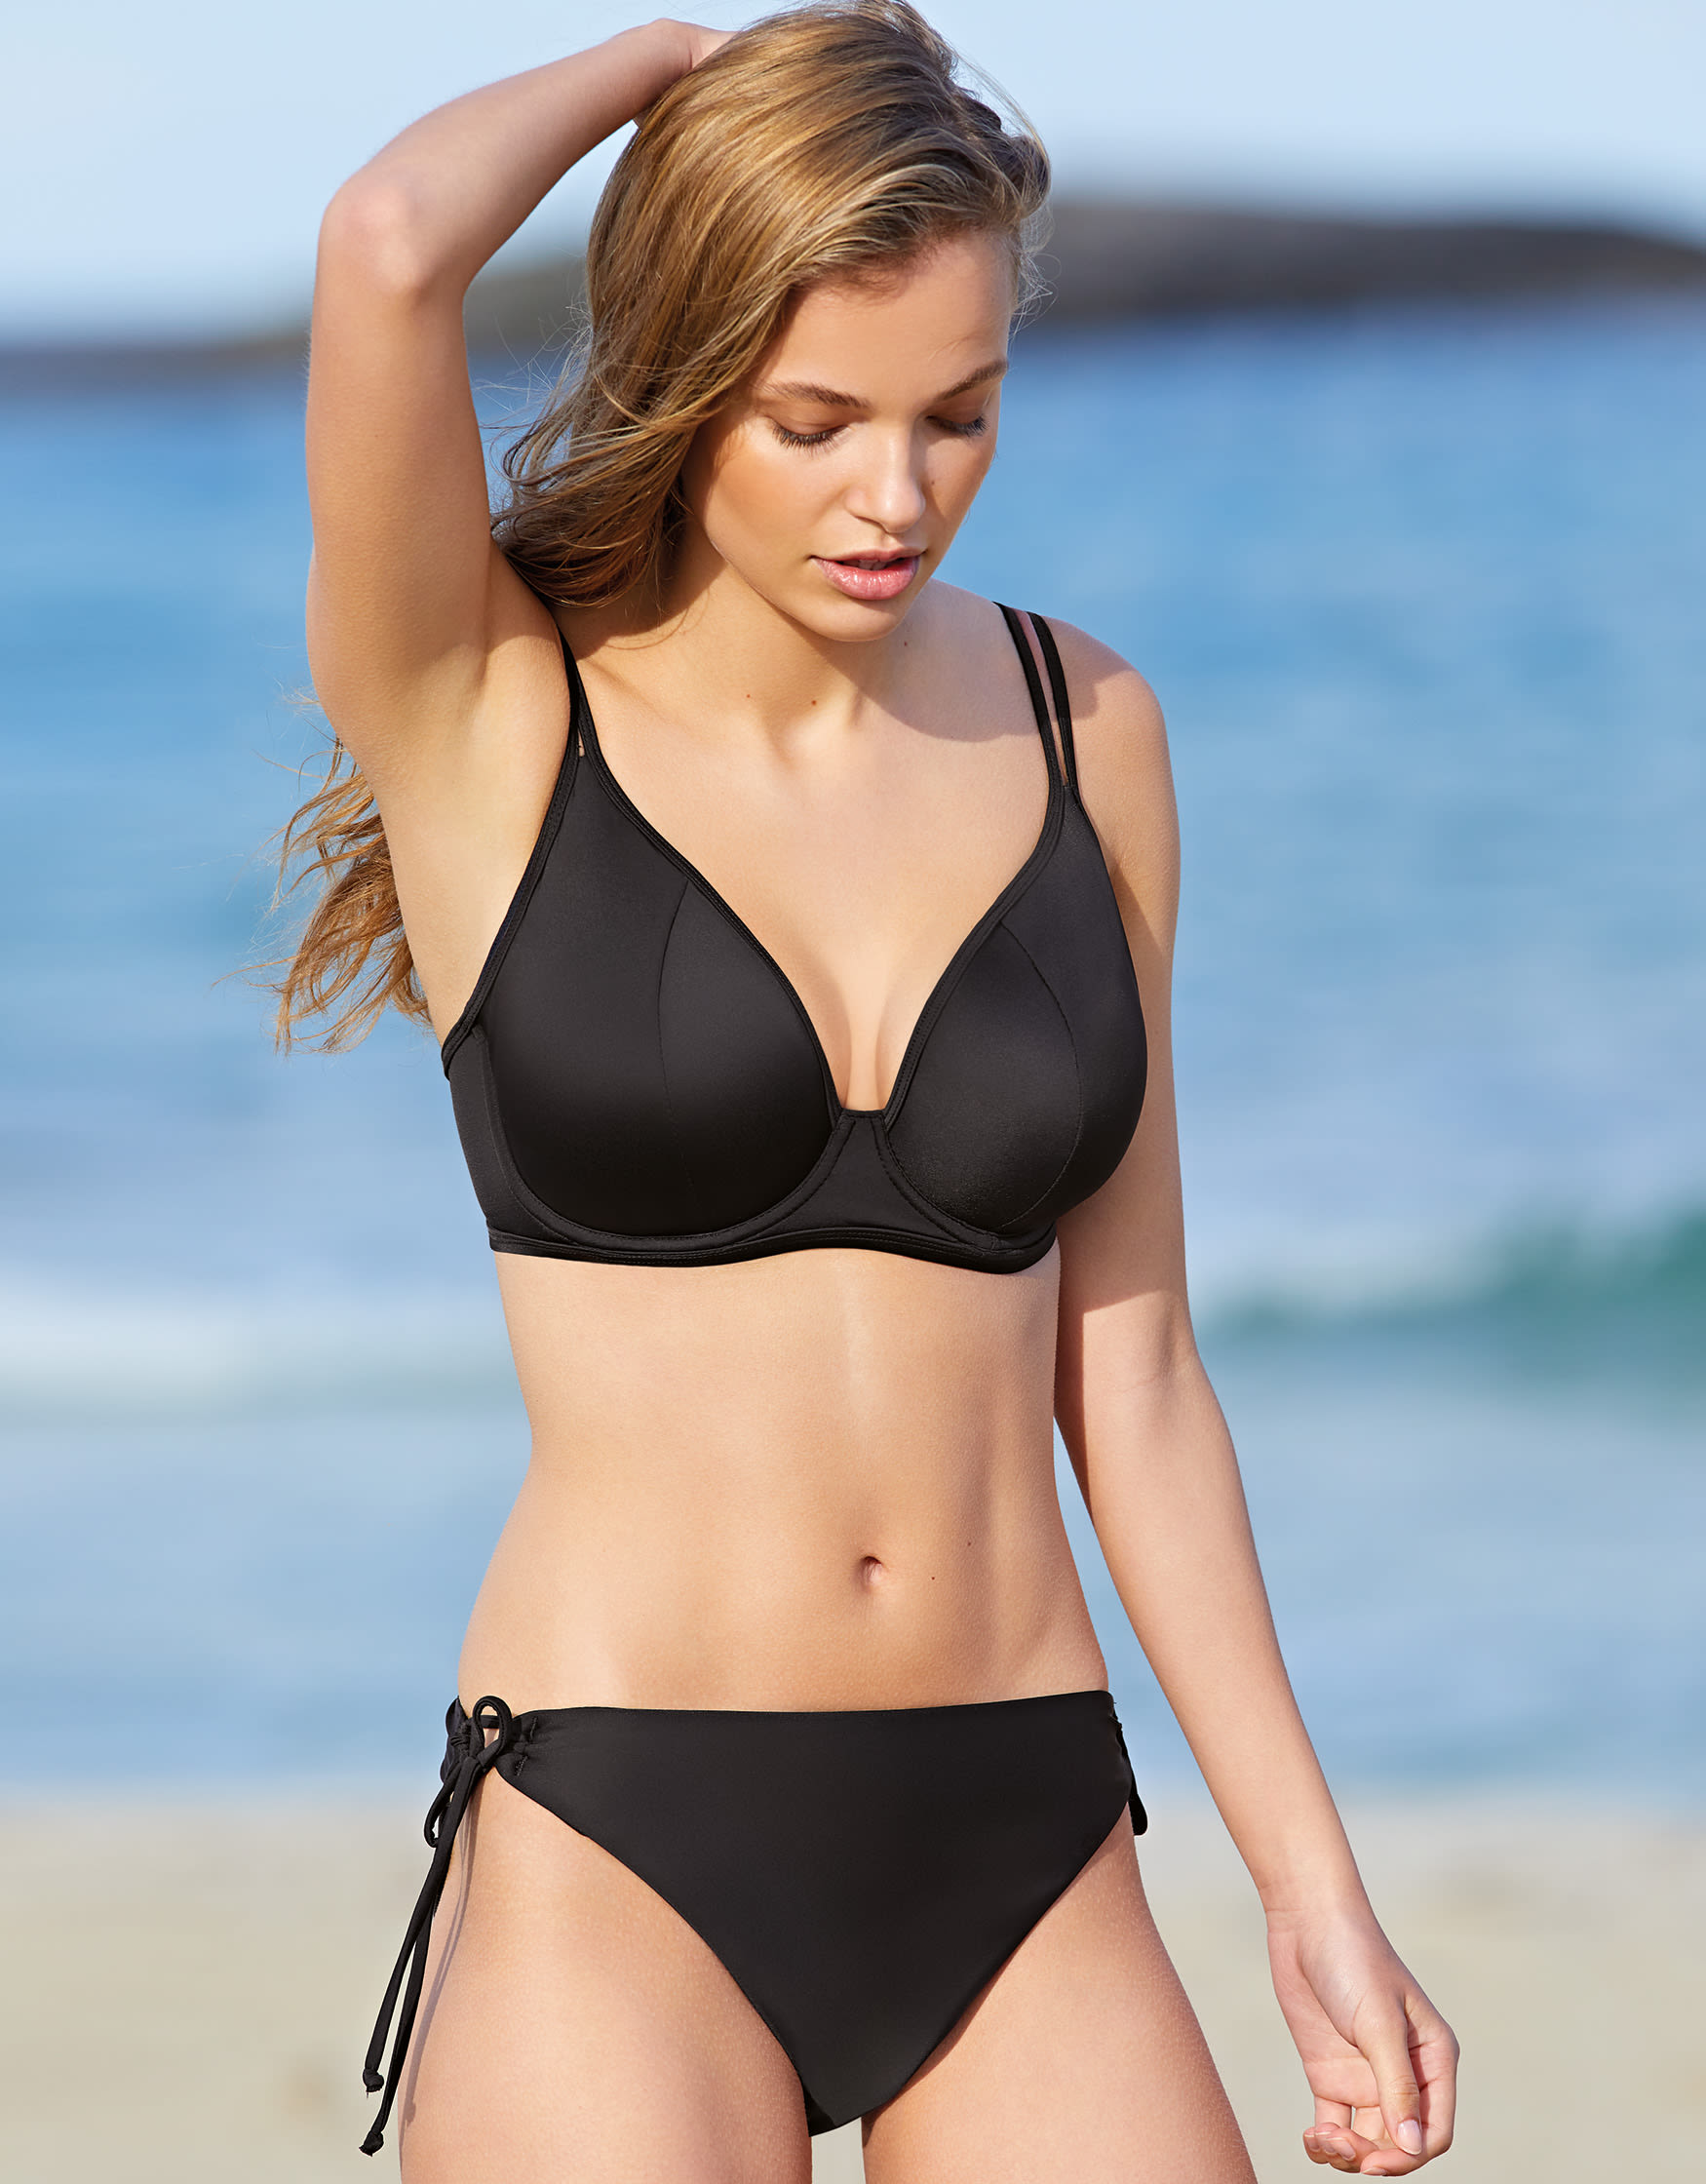 d7a0694db1c09 36GG Cup Bikinis   Swimwear